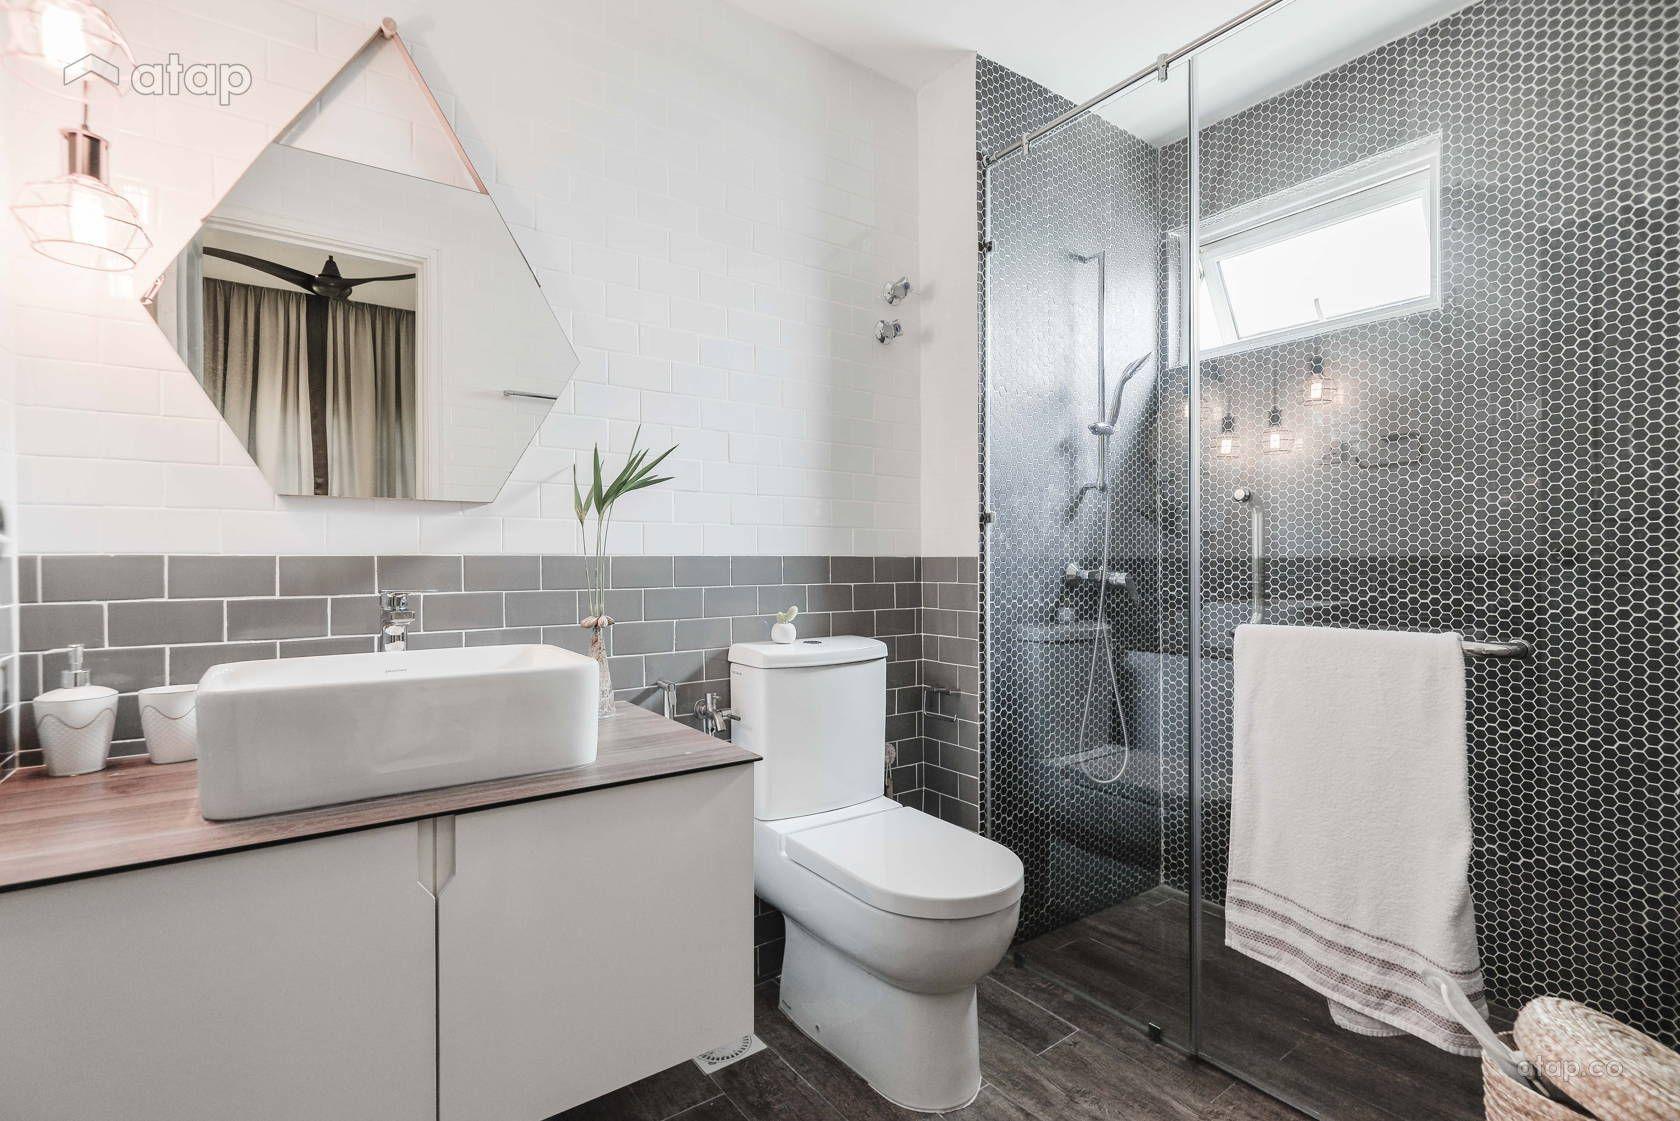 Minimalistic Modern Bathroom Condominium Design Ideas Photos Malaysia Atap Co Bathroom Design Bathroom Design Small Simple Bathroom Designs